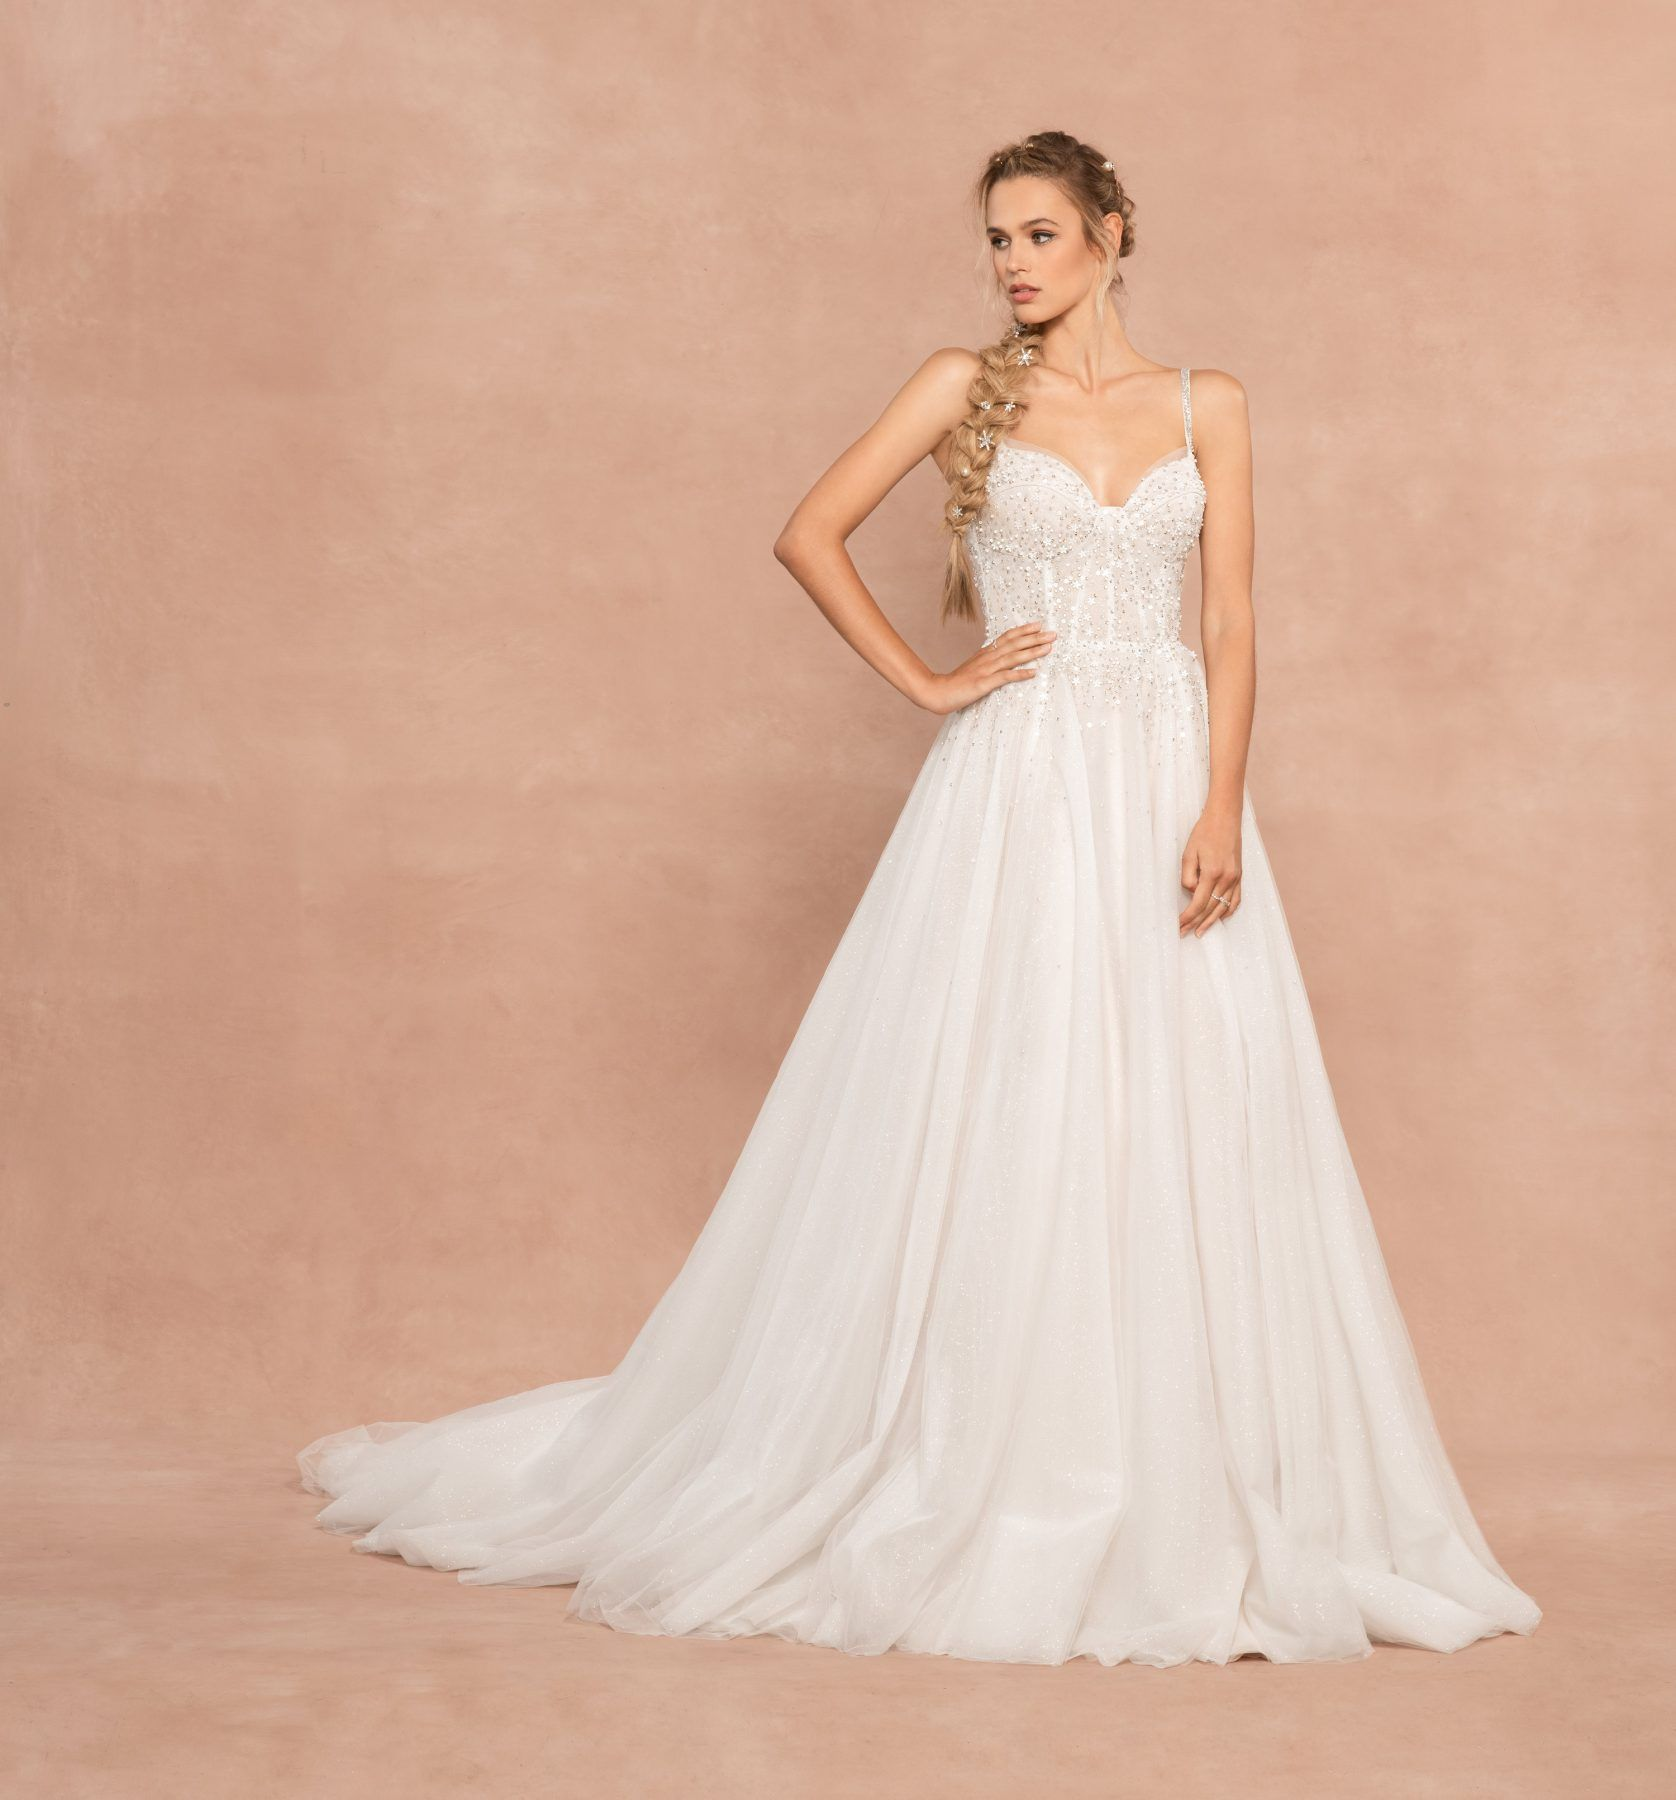 Spaghetti Strap Sweetheart Neckline Aline Wedding Dress